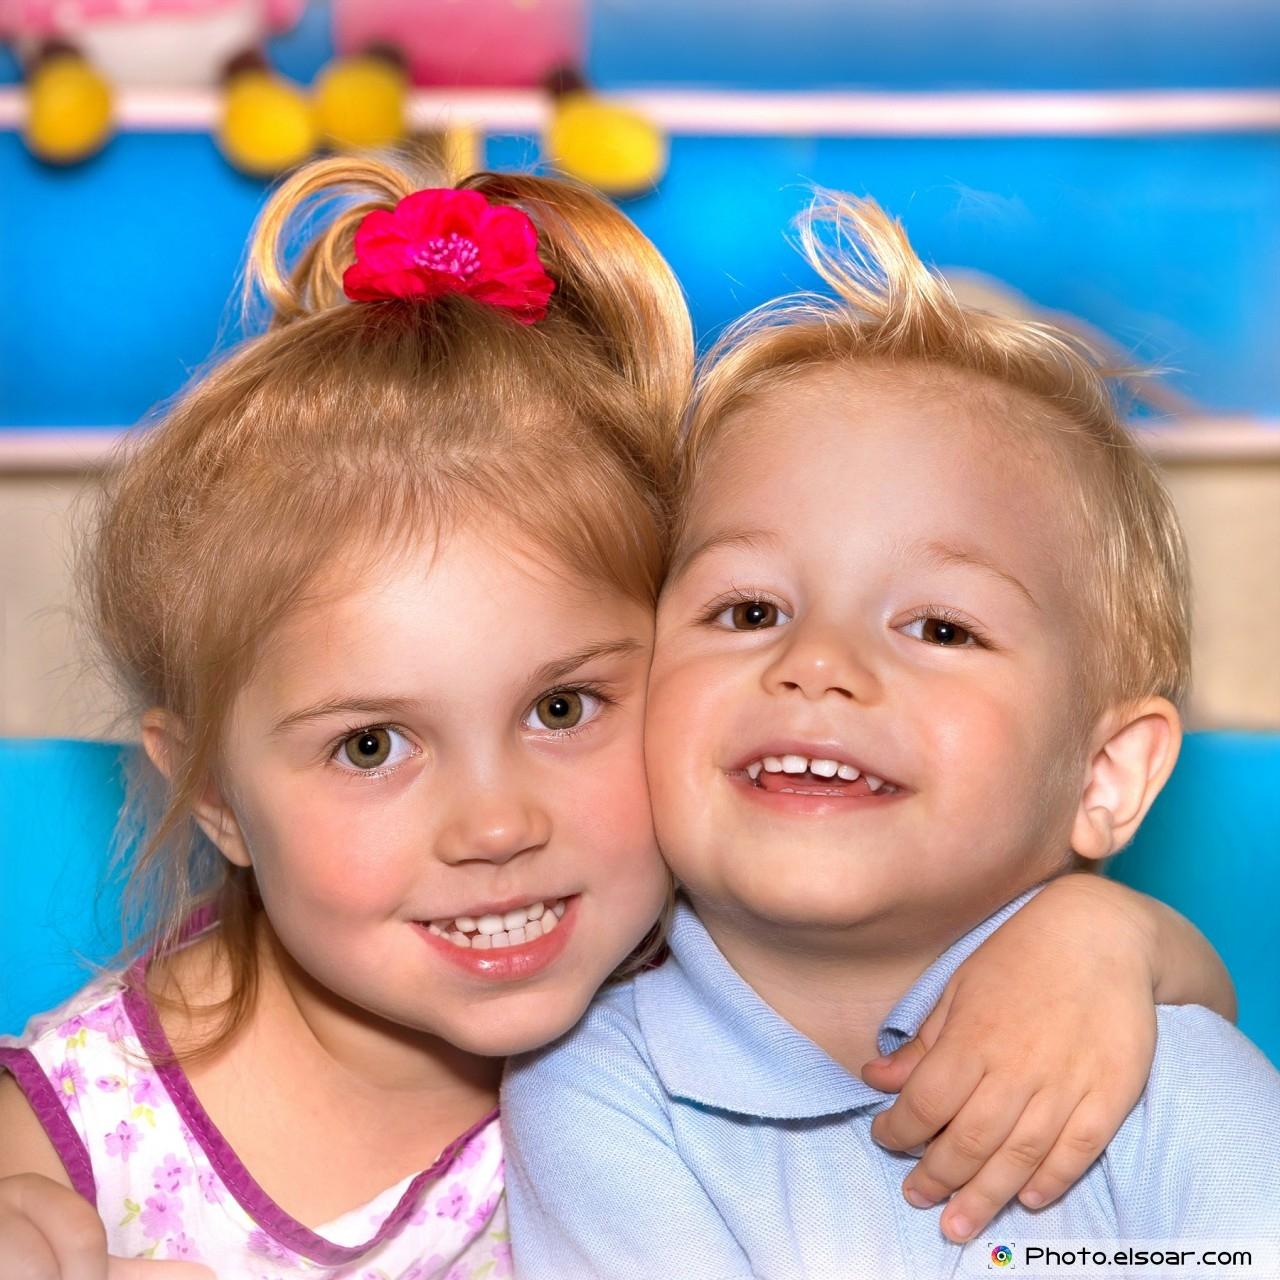 Two happy child